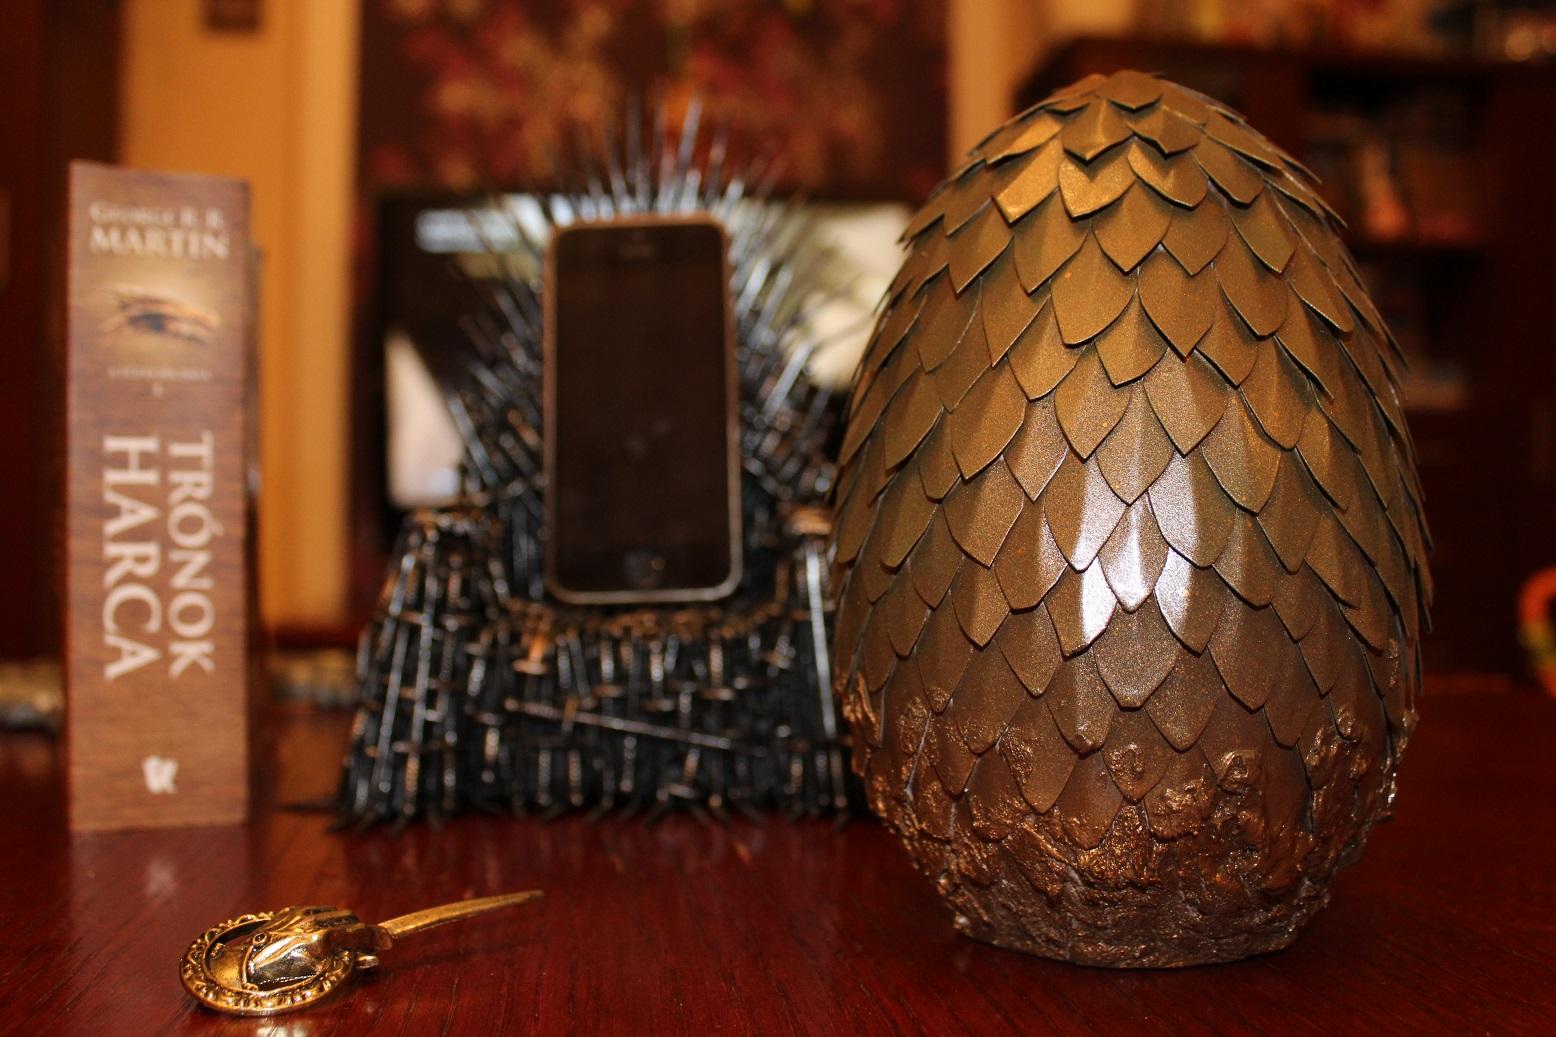 szmk_diy_tronok_harca_sarkanytojas_drogon_targaryen_danerys_dragonegg_game_of_thrones_hbo_winter_is_coming_westeros_csinald_magad_4.JPG